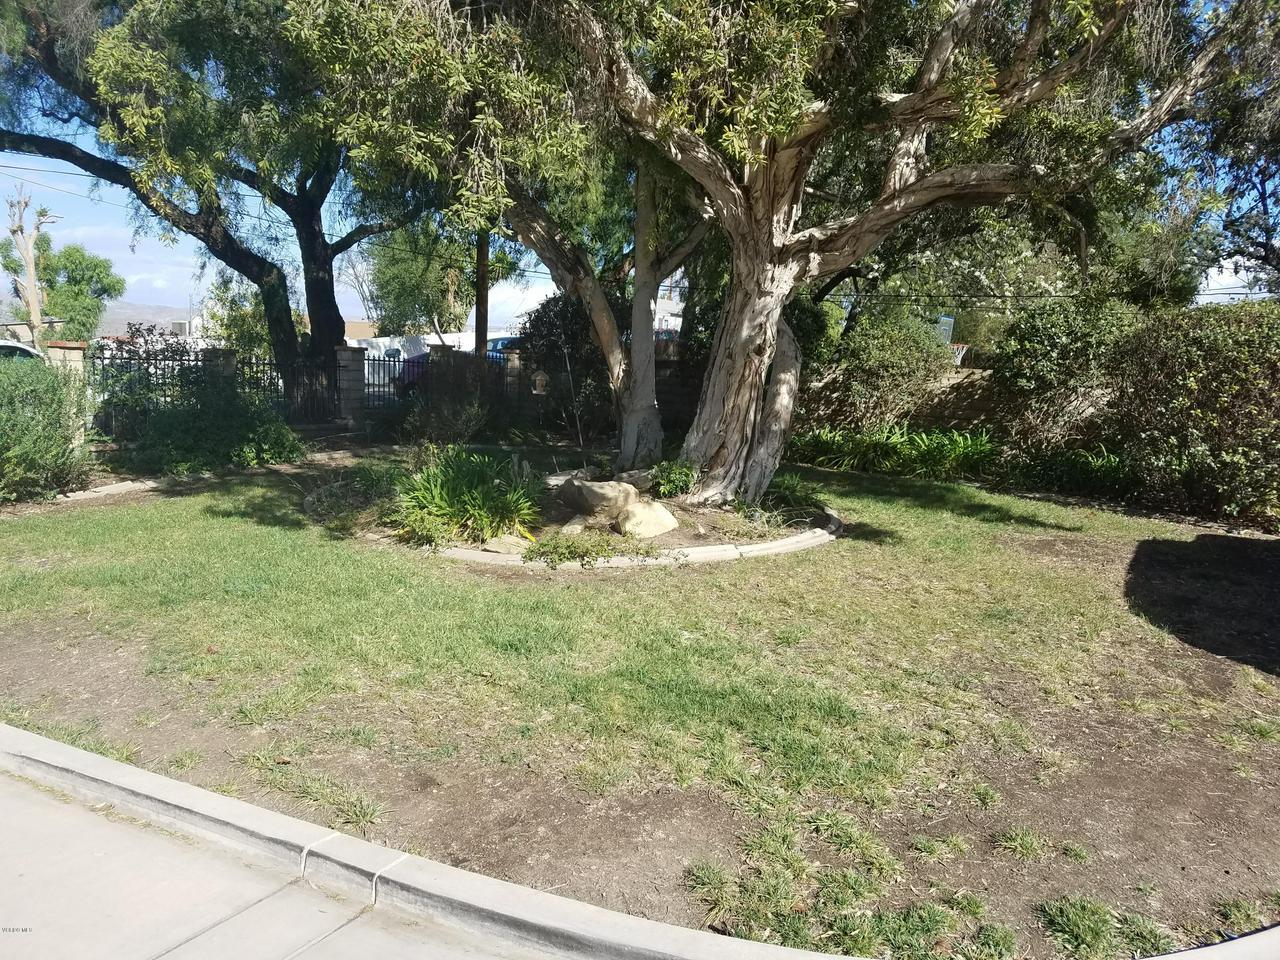 10720 TERNEZ, Moorpark, CA 93021 - Front Landscaping